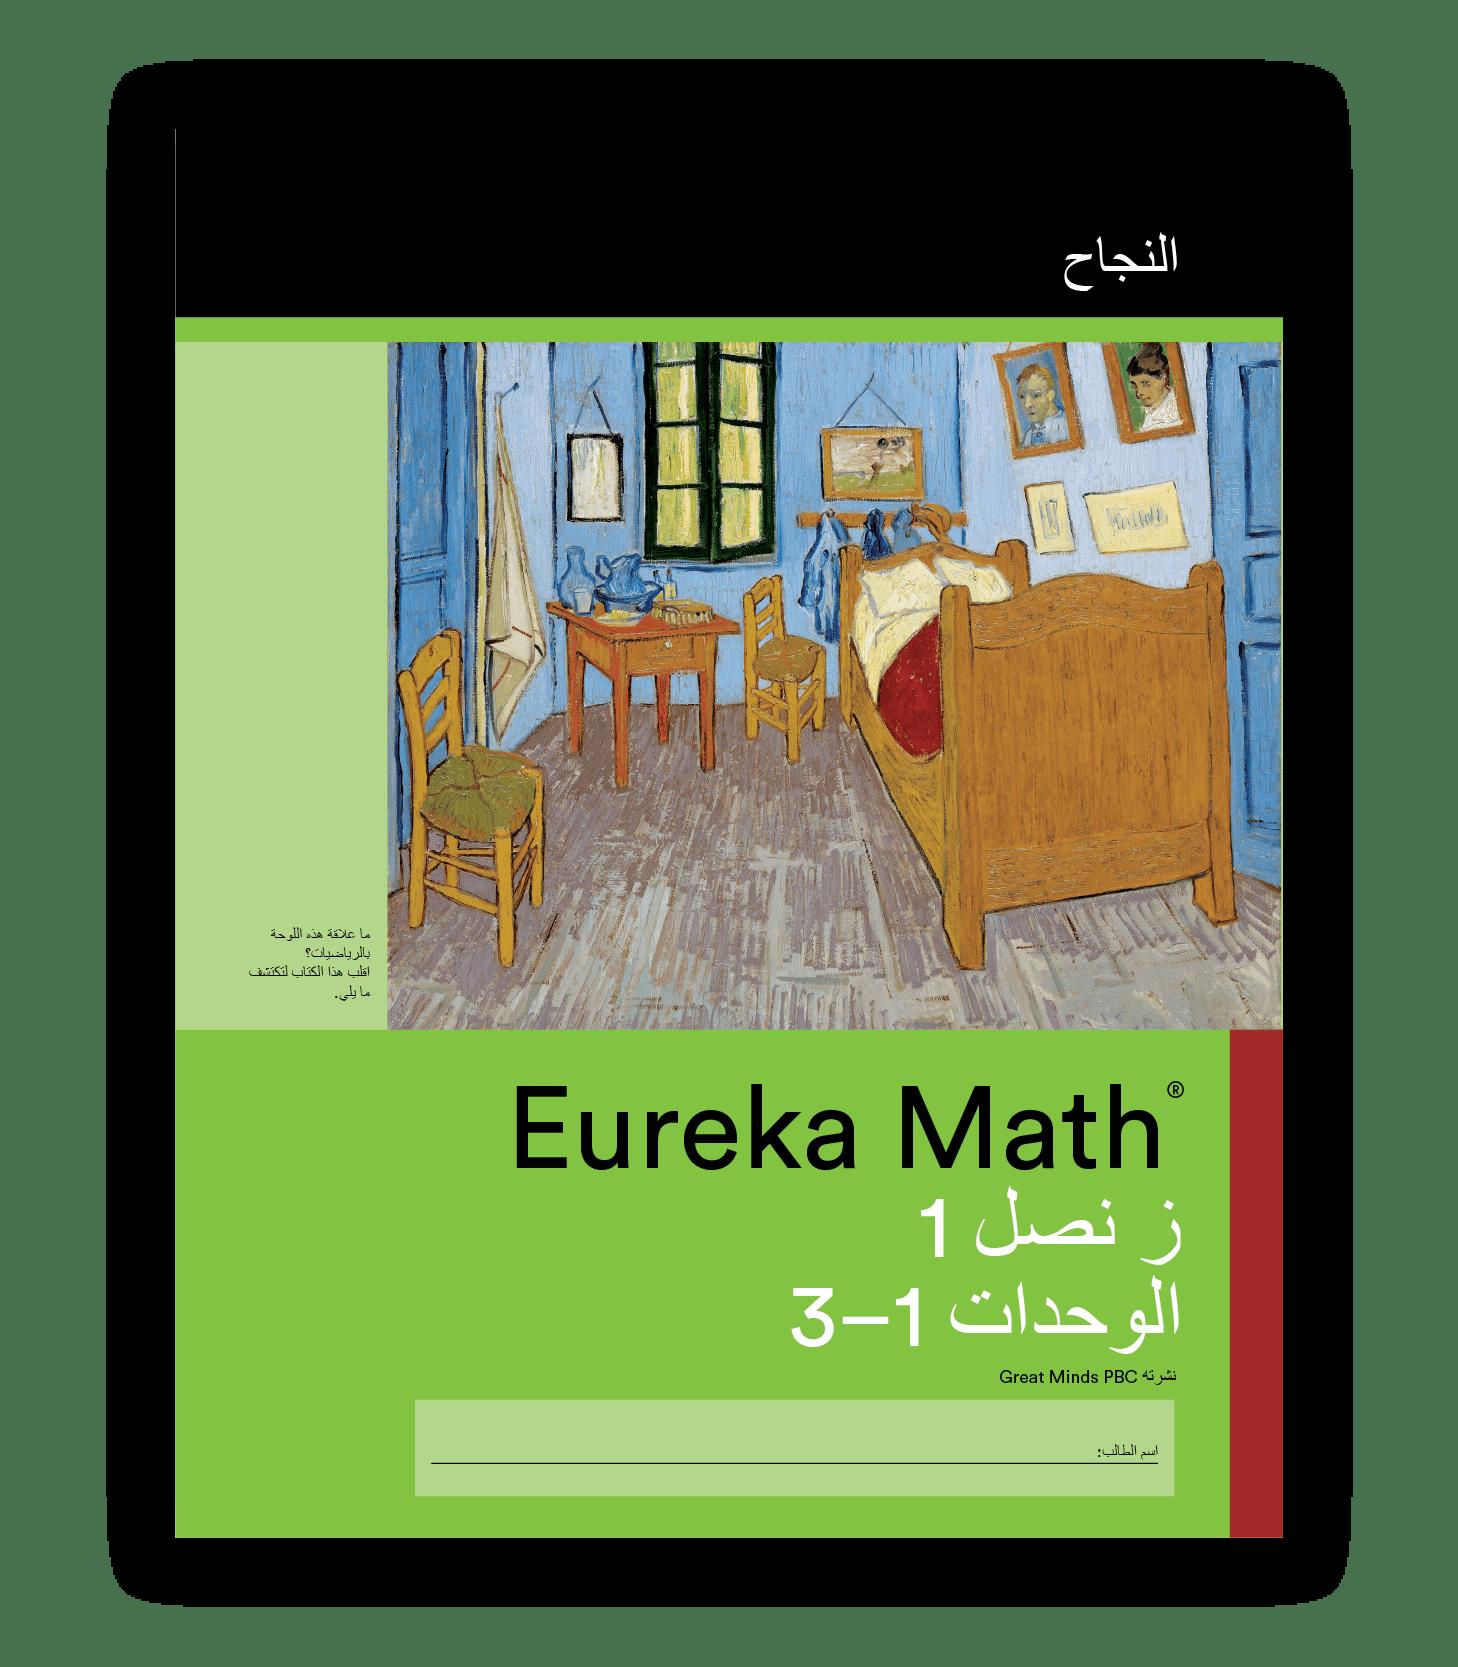 Eureka Math Succeed Book in Arabic for Grade 1